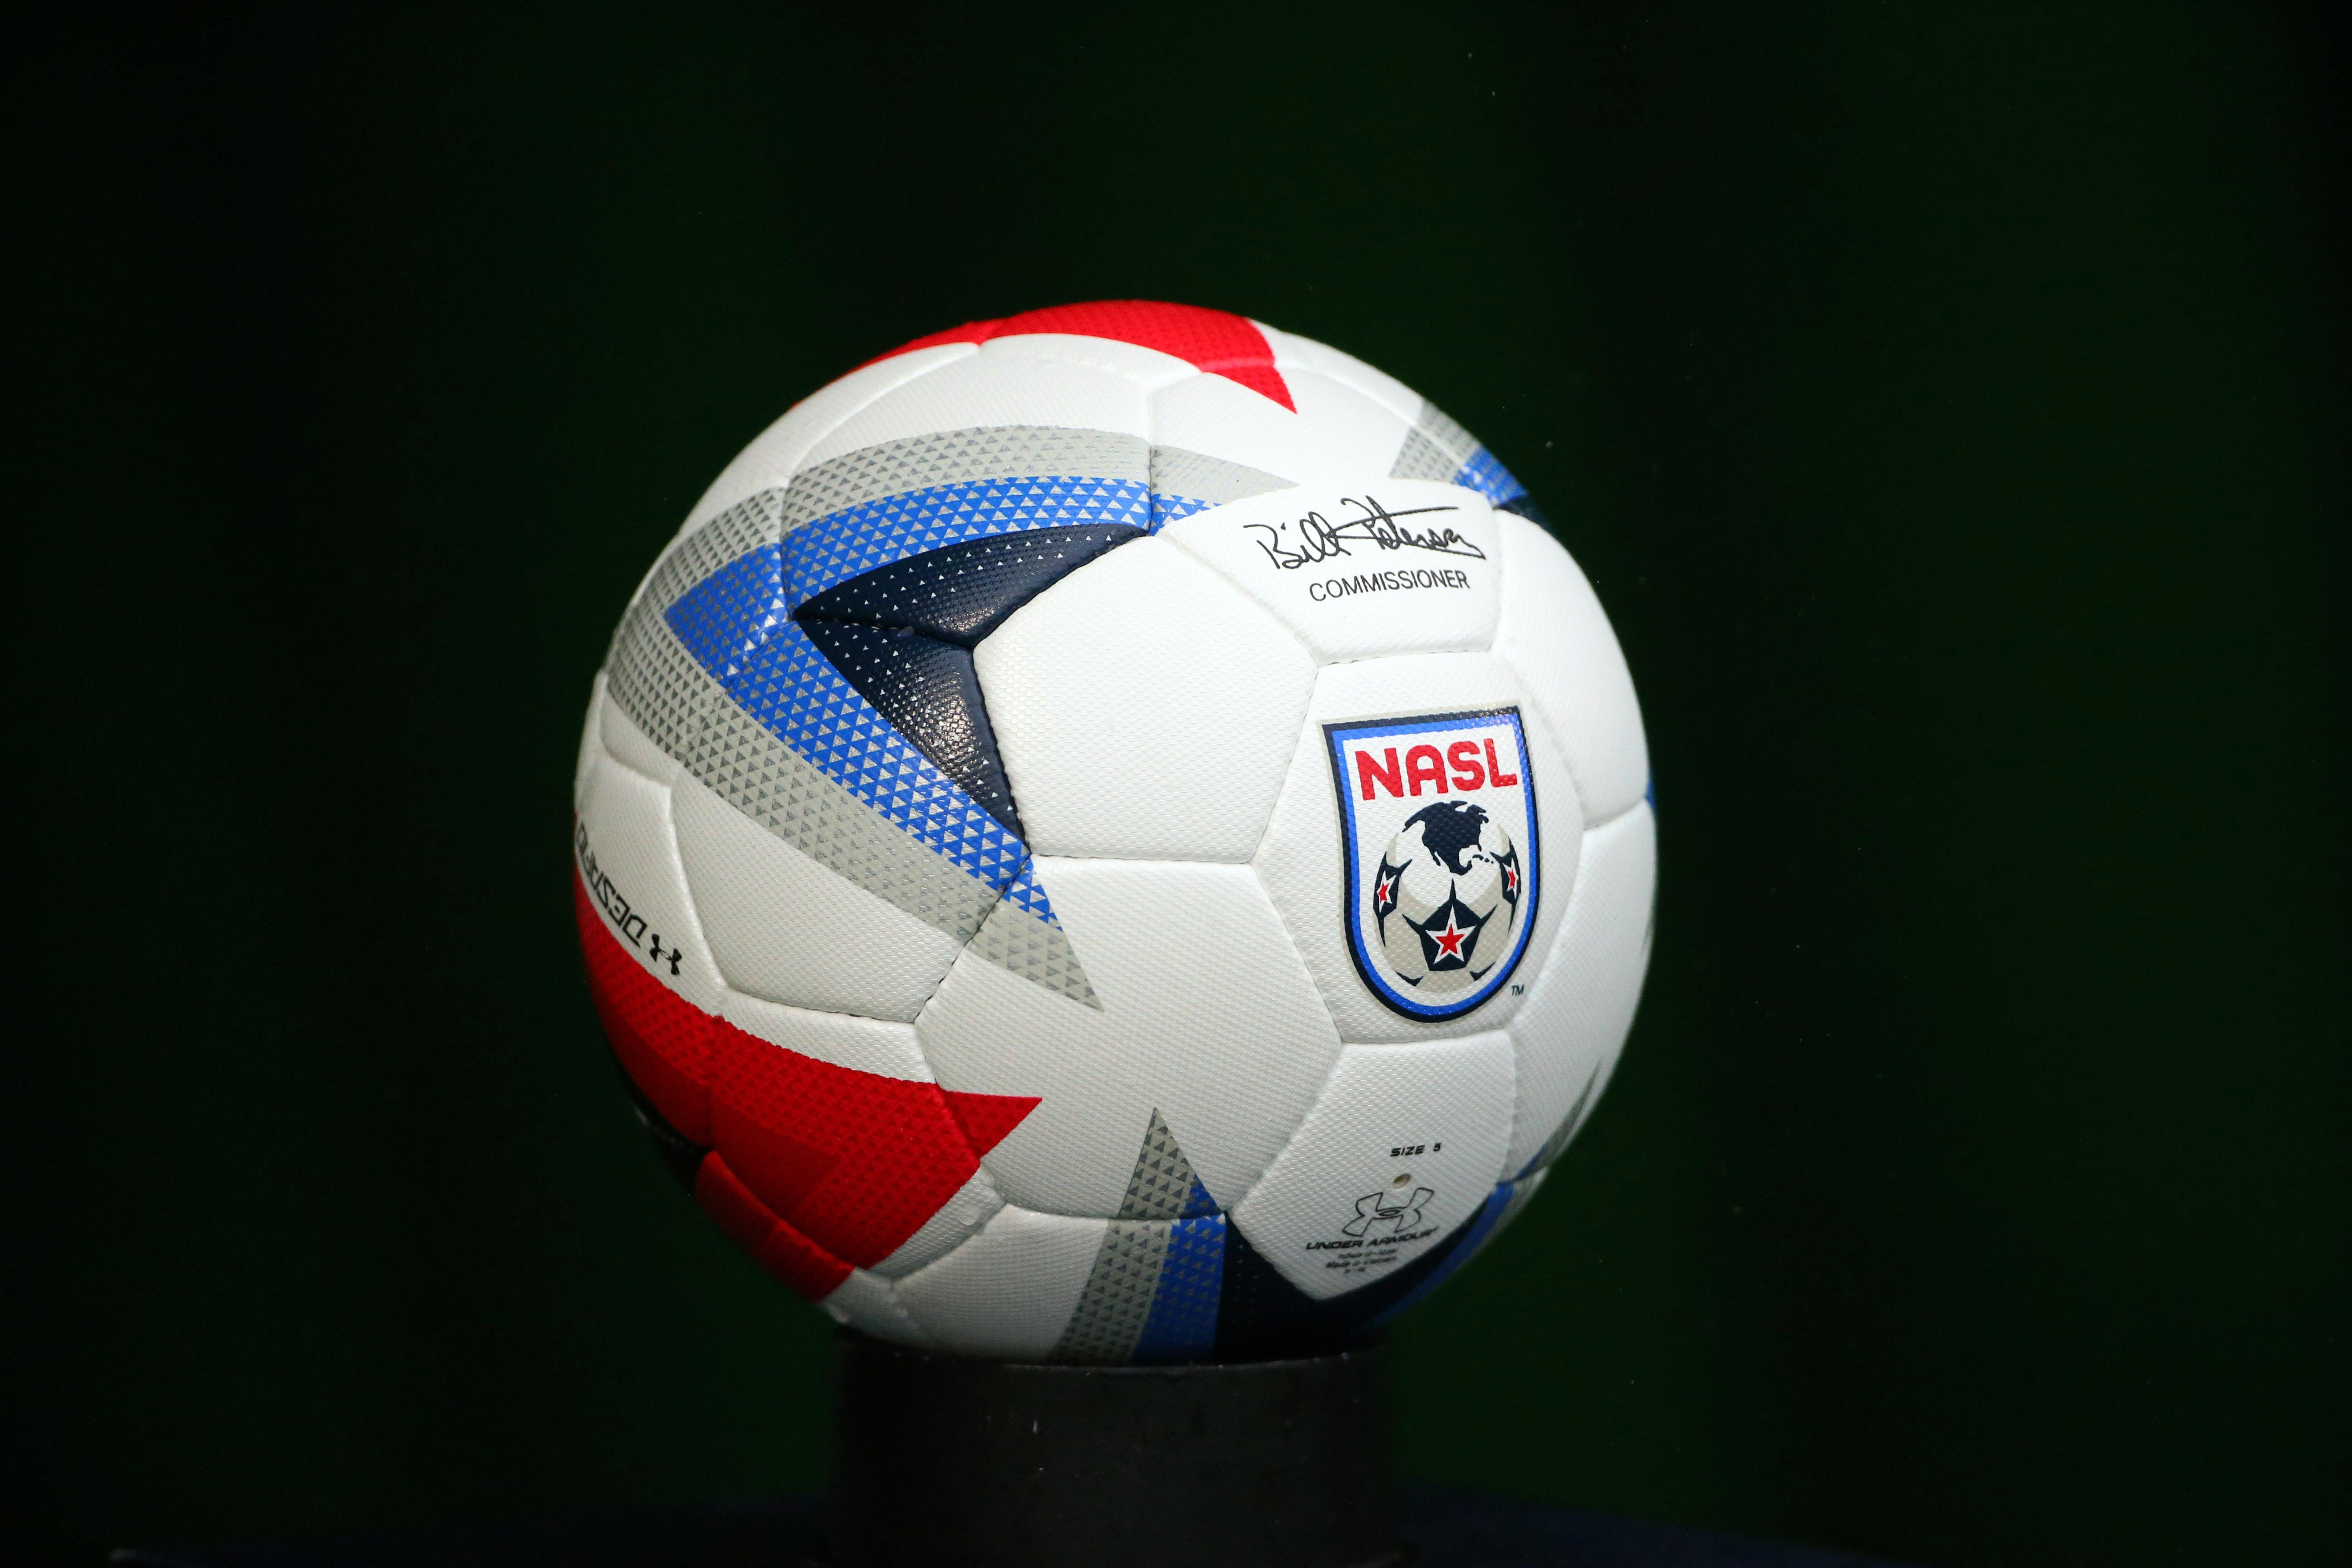 Soccer: Carolina Railhawks at New York Cosmos